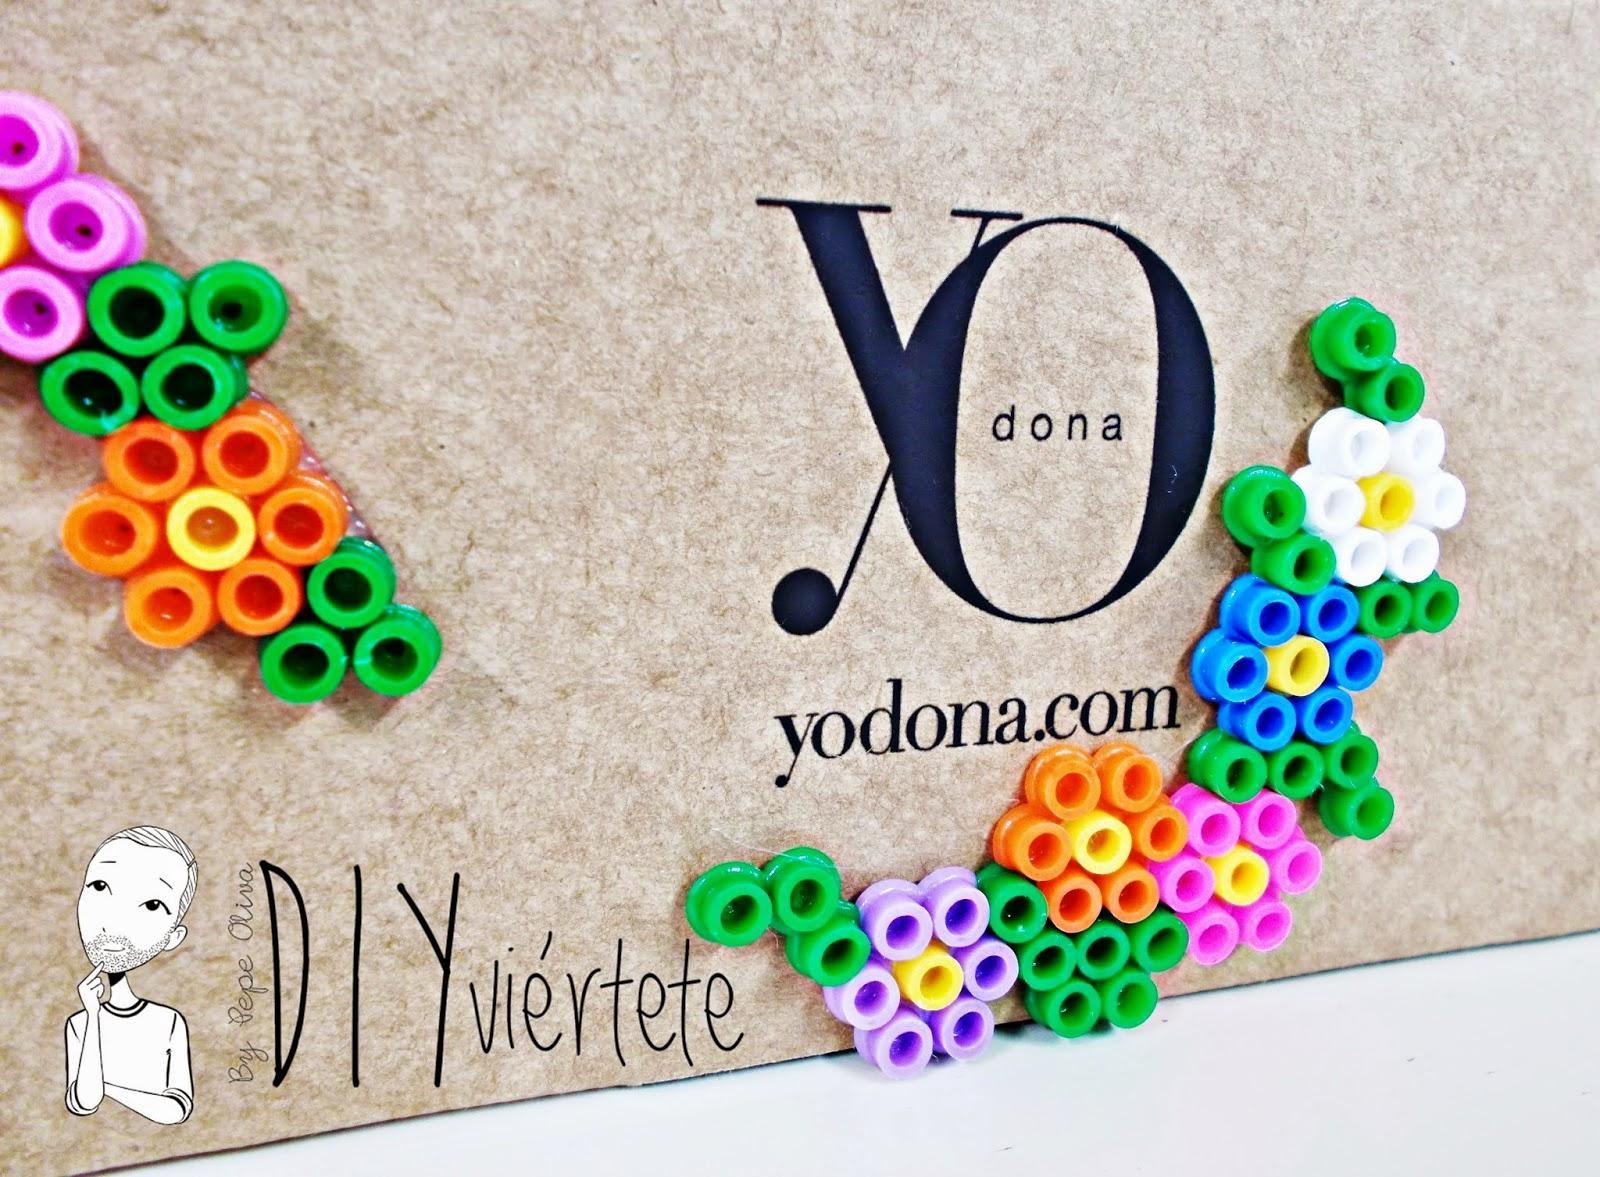 DIY-Do It Yourself-caja-cartón-selfpackaging-customizar-handbox-yodona-diyhuntersday-craftlovers-6